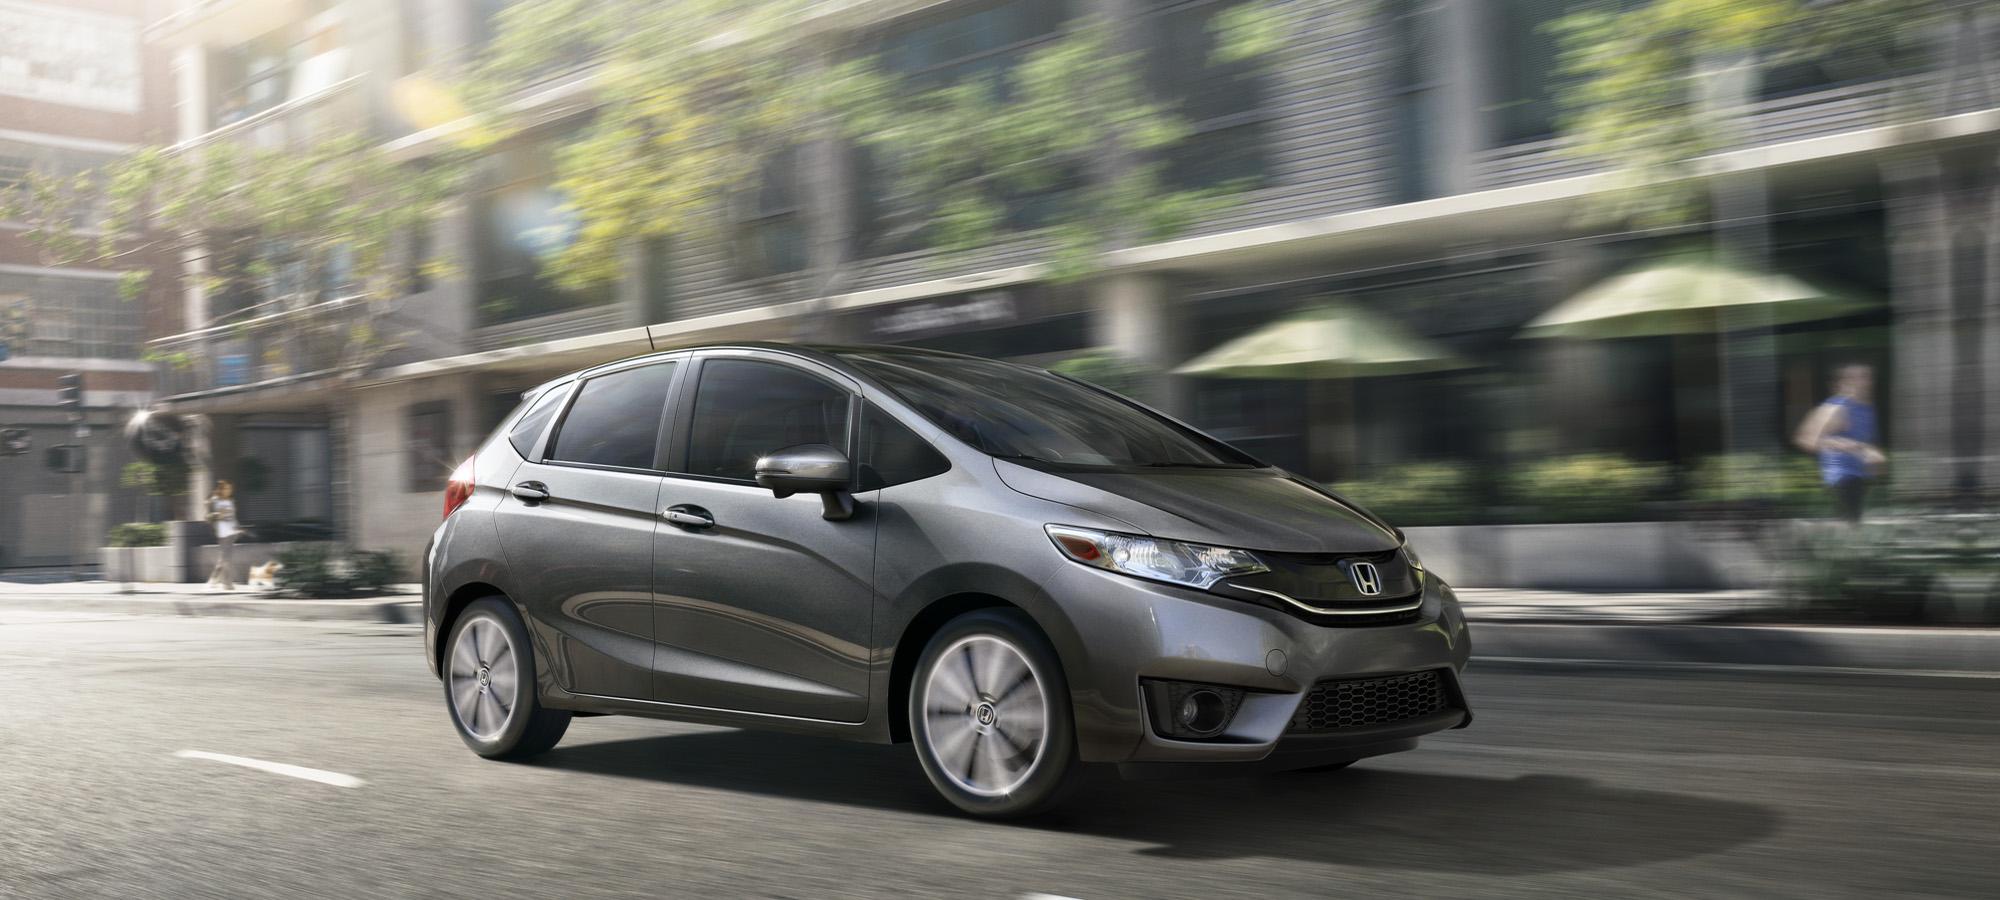 Honda Lease Deals Milwaukee Wi | Lamoureph Blog